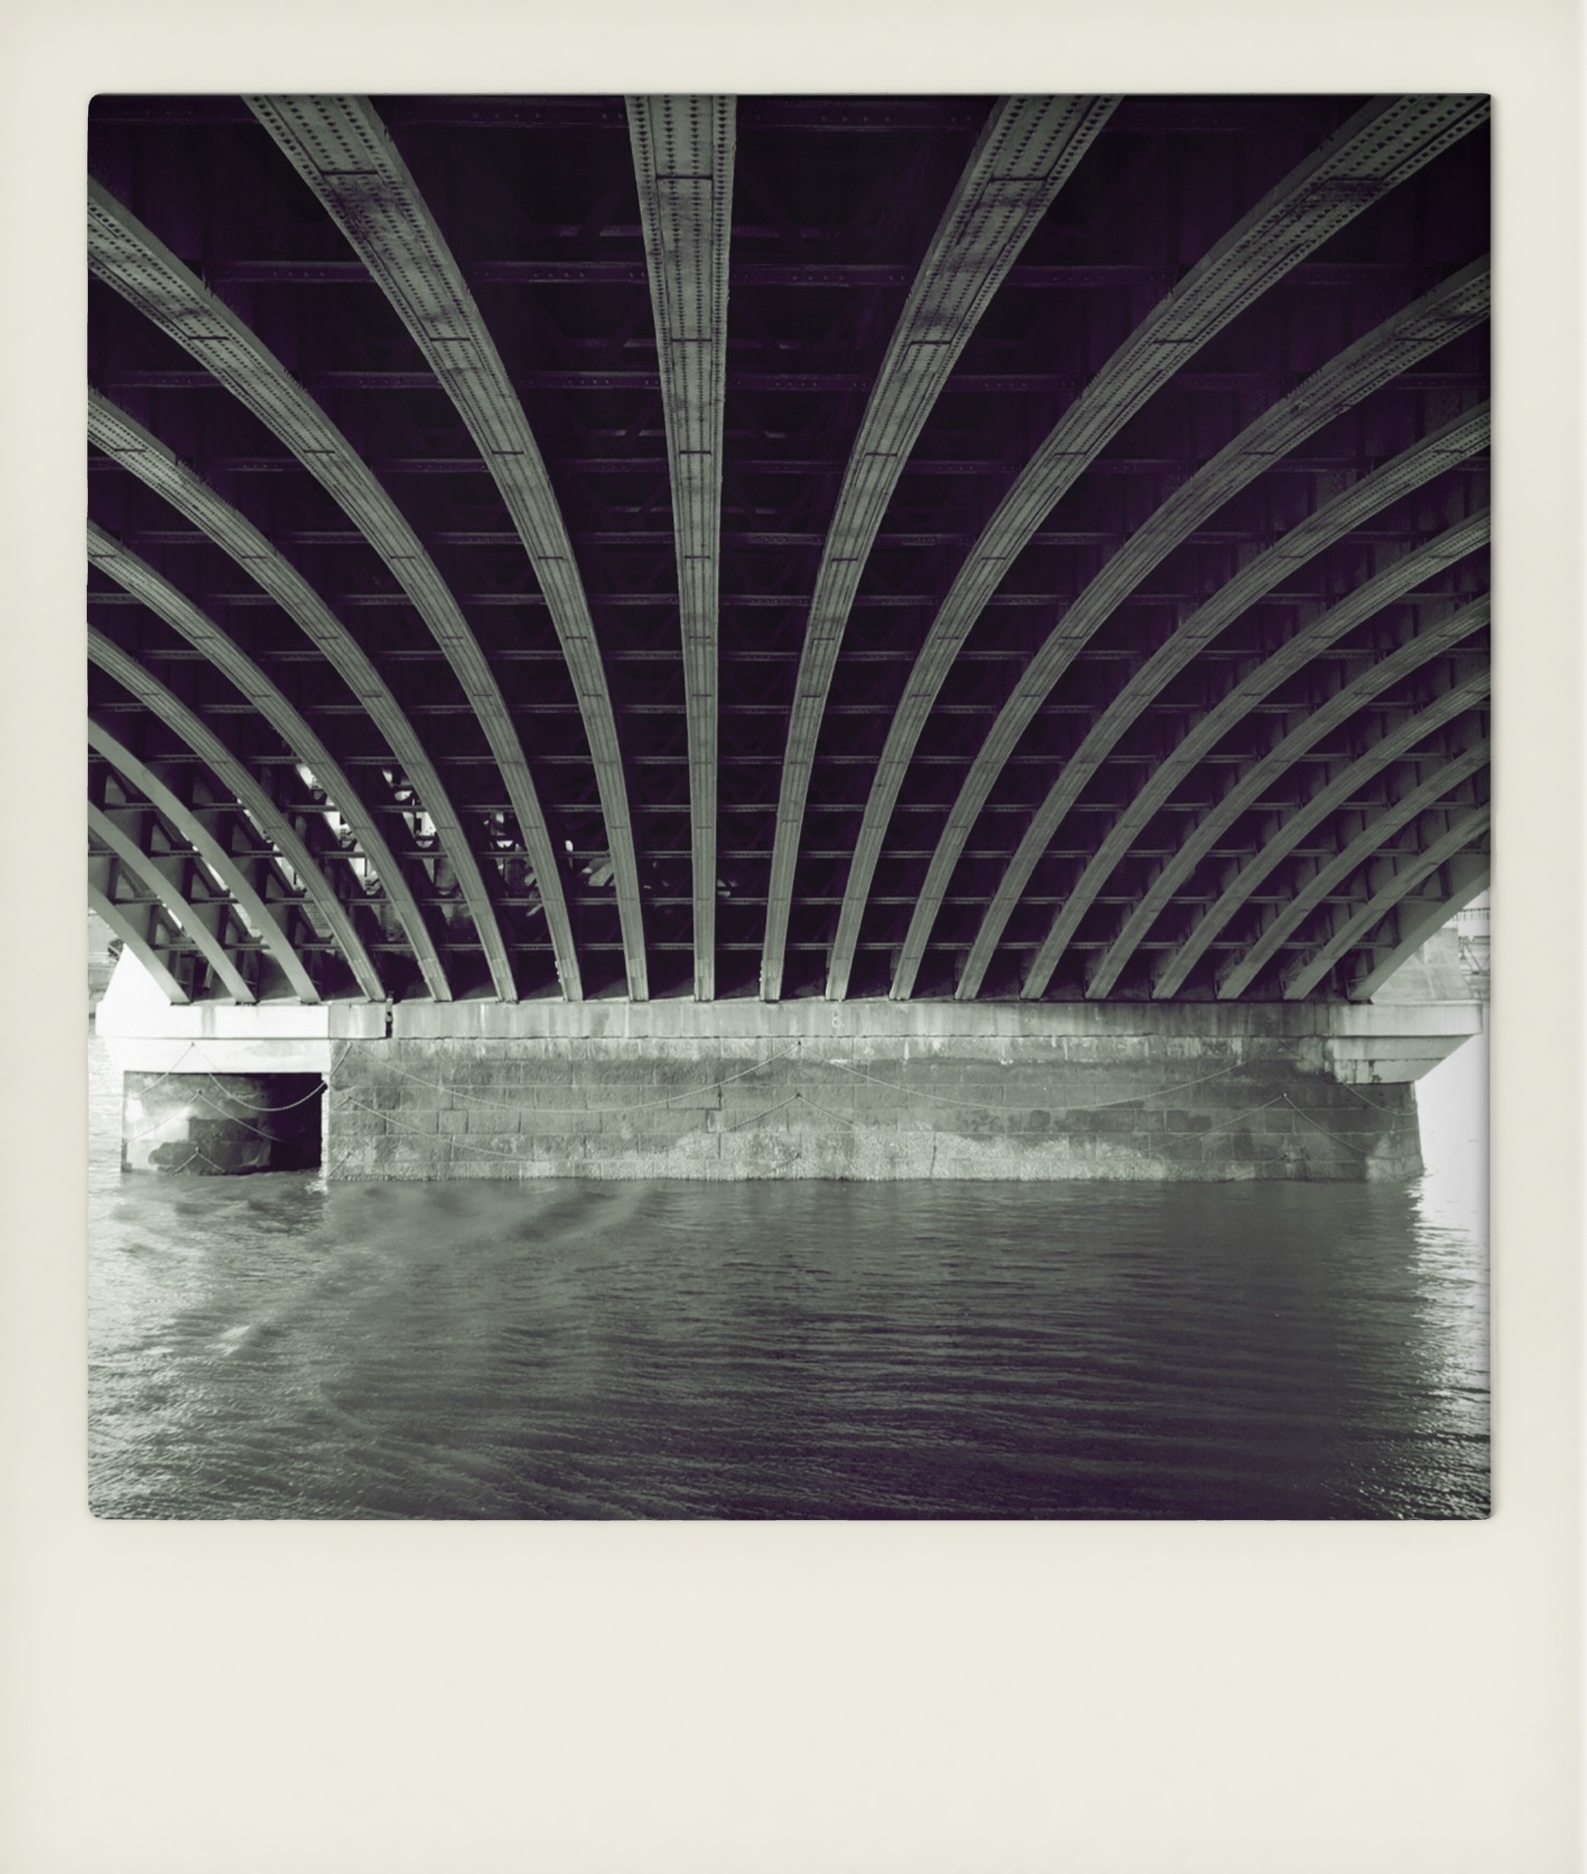 Blackfriars Bridge, Viewed Sout - phil_levene | ello